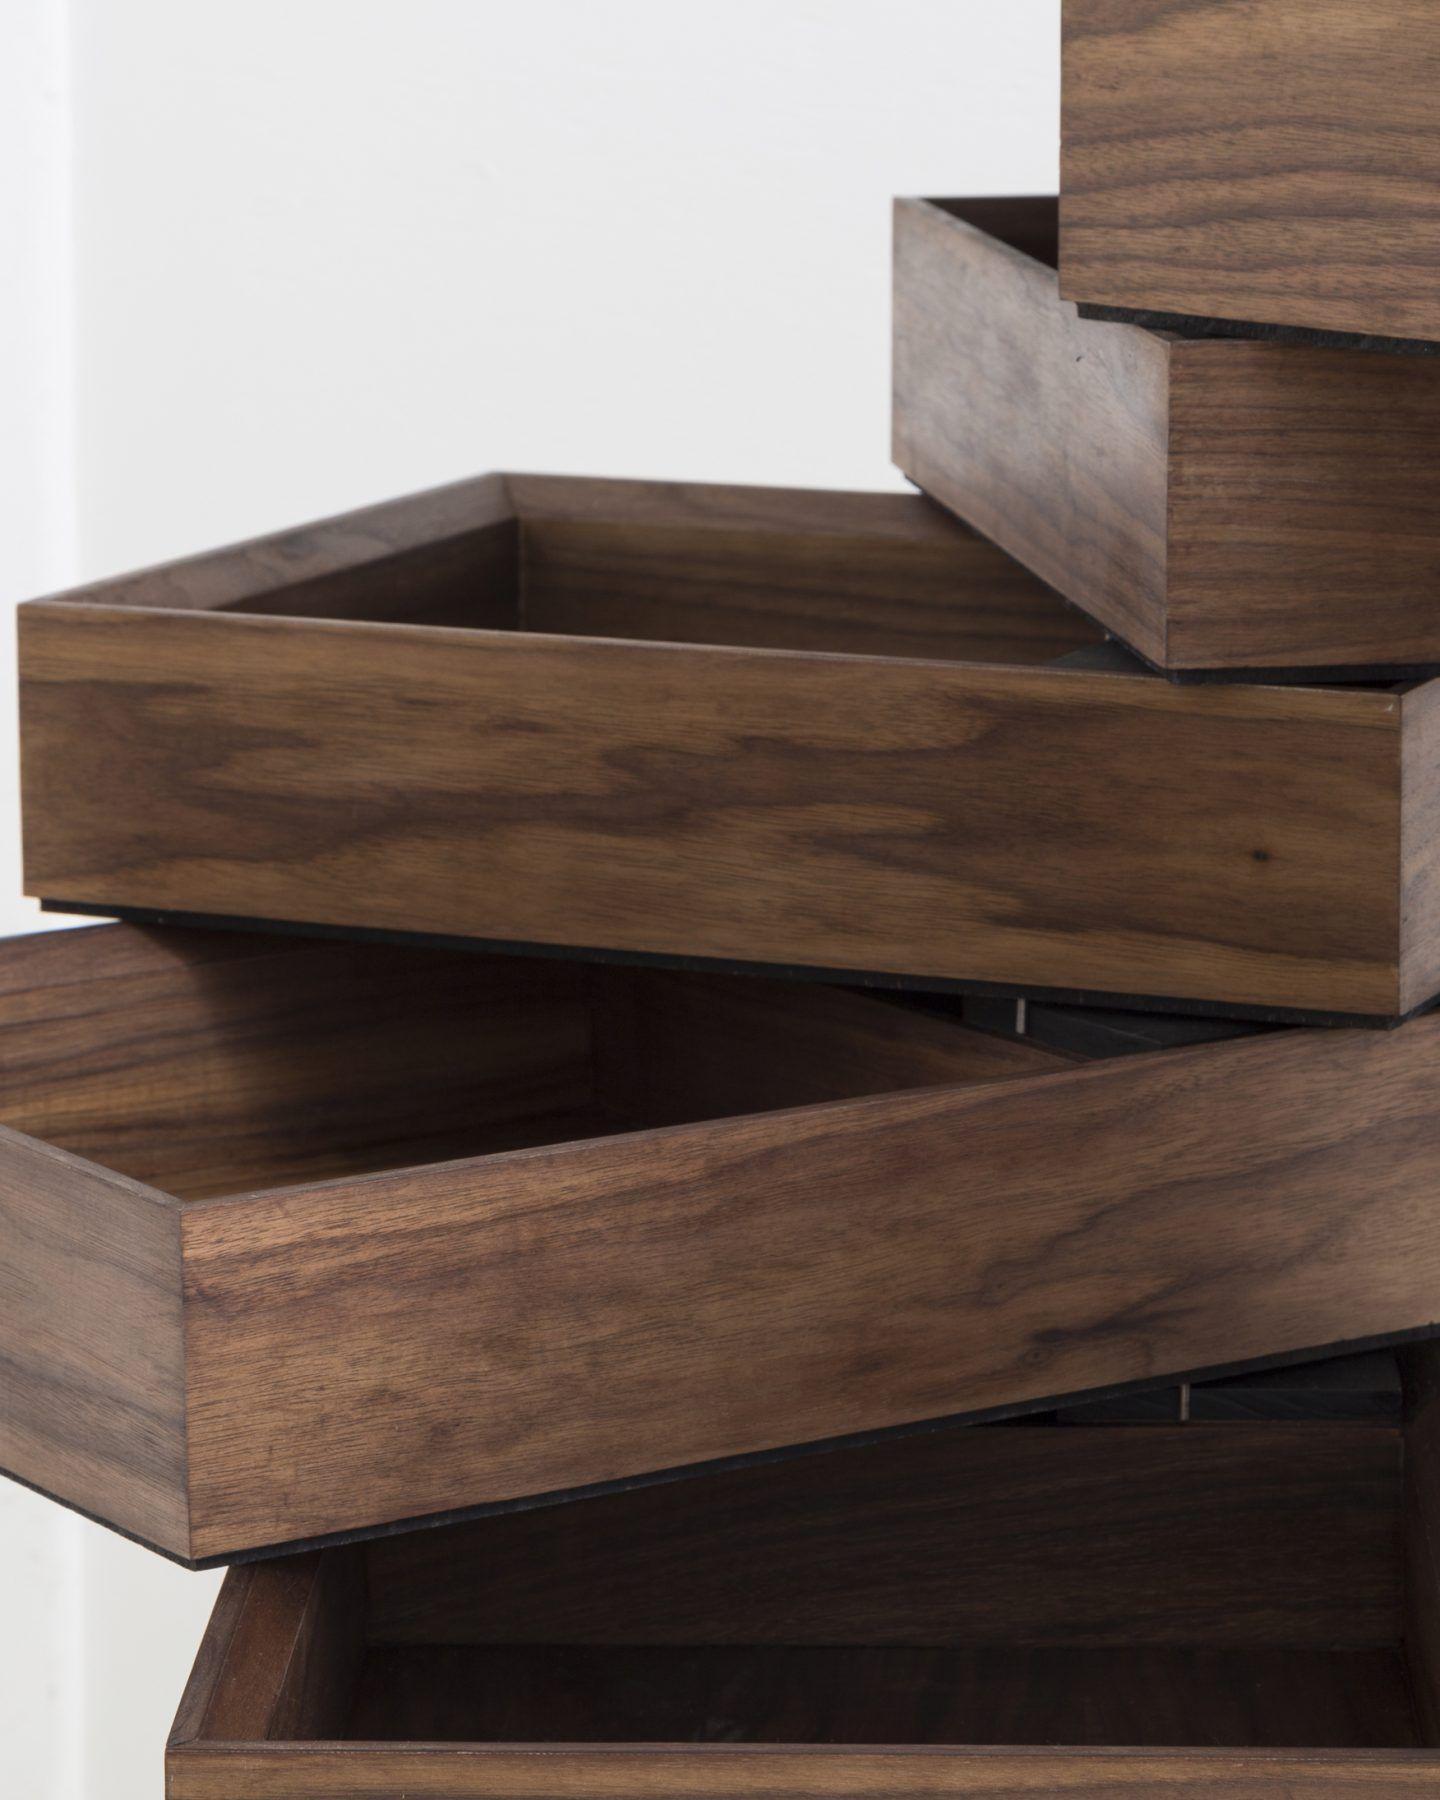 IGNANT-Design-Sebastian-Errazuriz-Cabinet-015